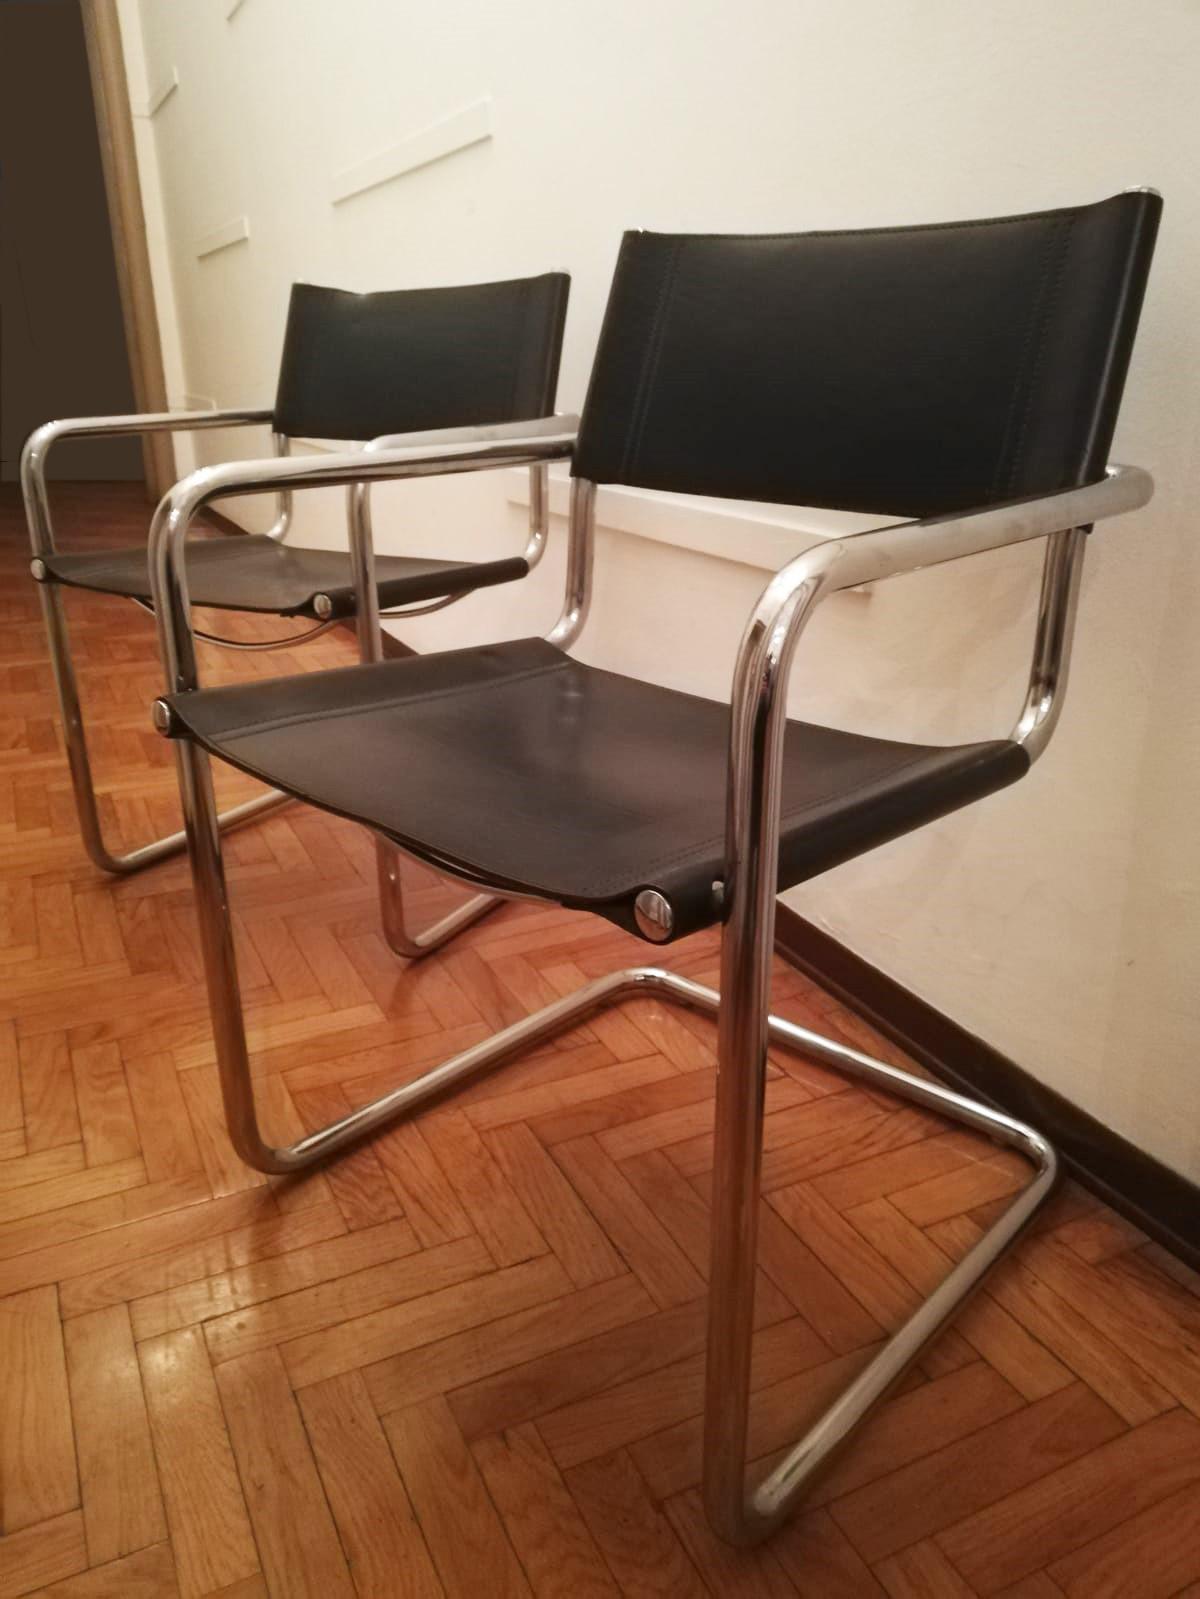 a91-ab-matteo-grassi-chairs